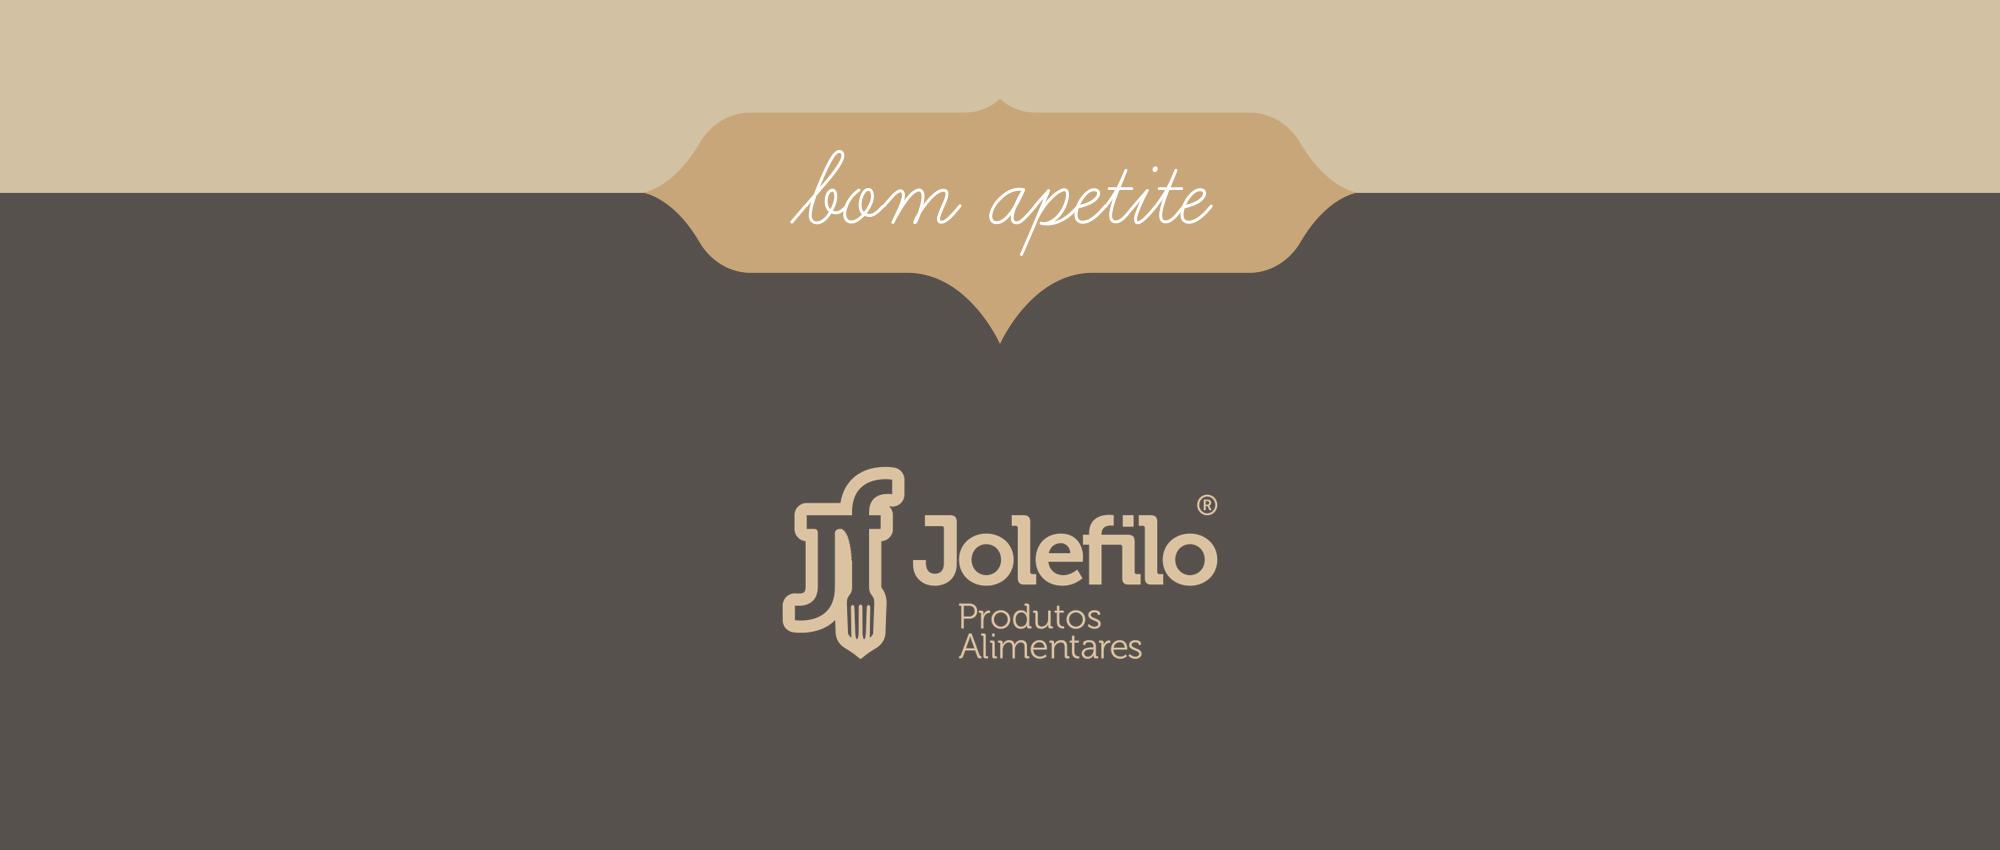 jolefilo-07